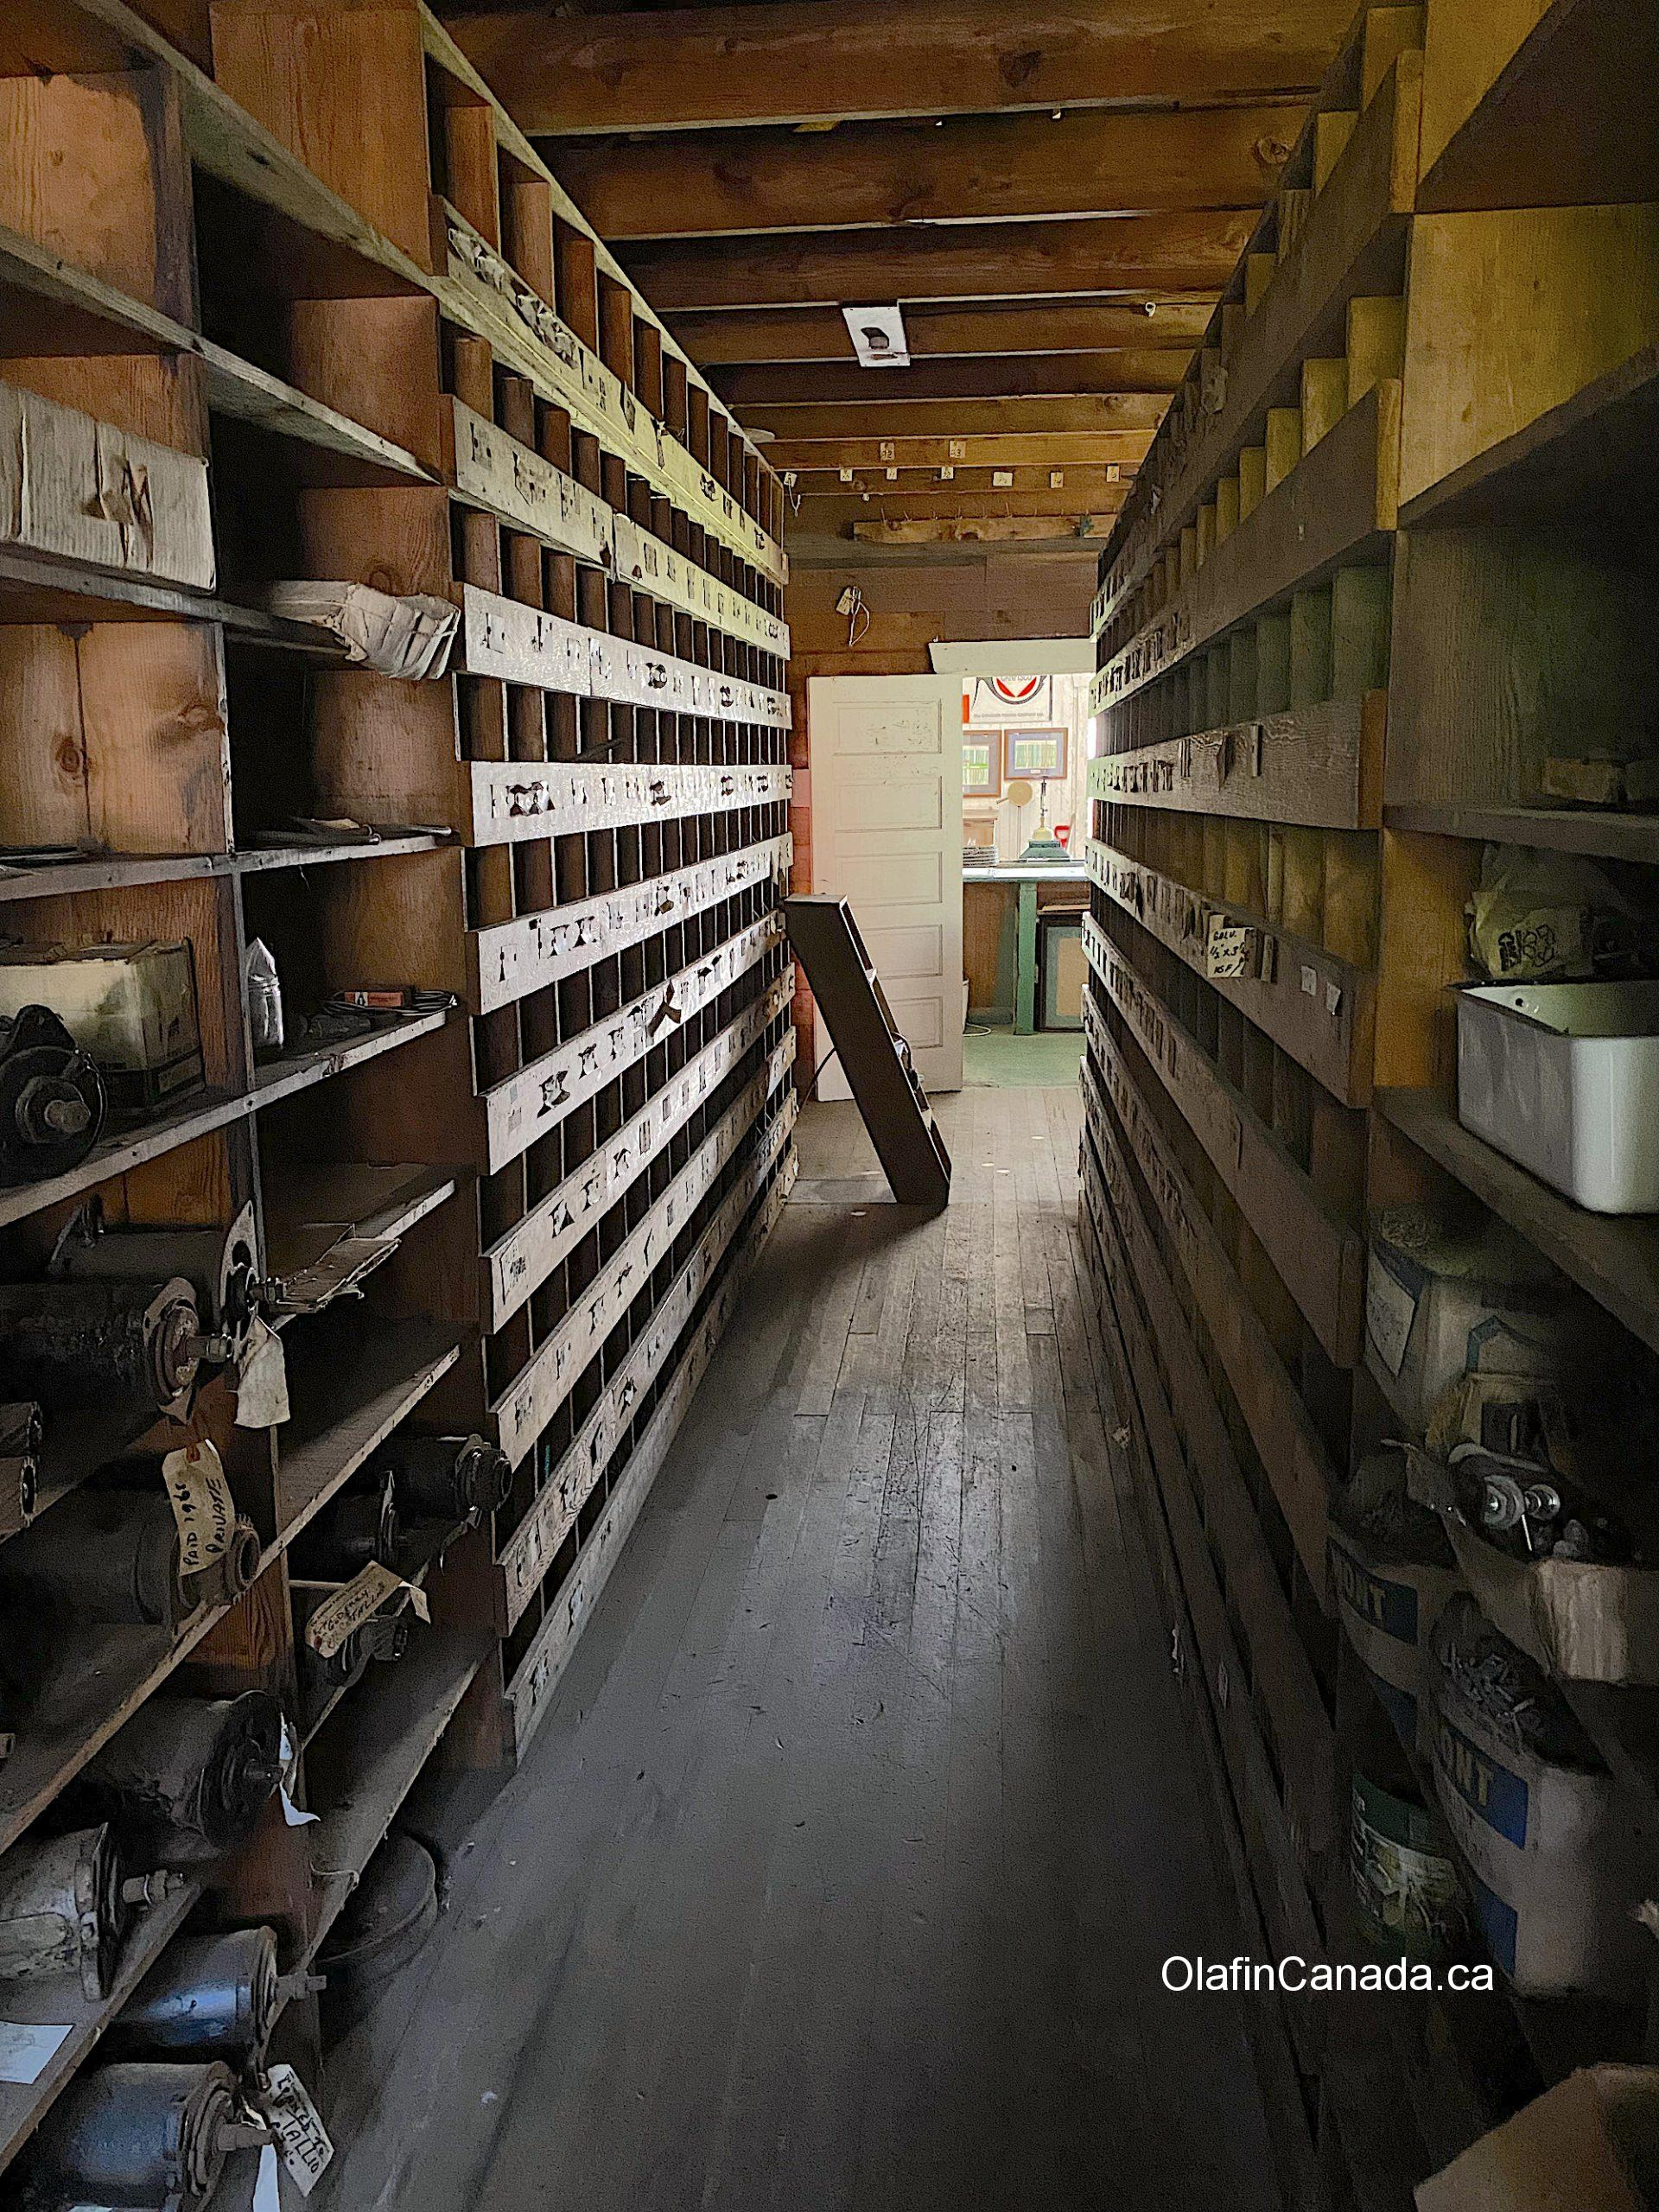 Storage room behind the shop of the Tallheo Canery #olafincanada #britishcolumbia #discoverbc #abandonedbc #tallheocannery #bellacoola